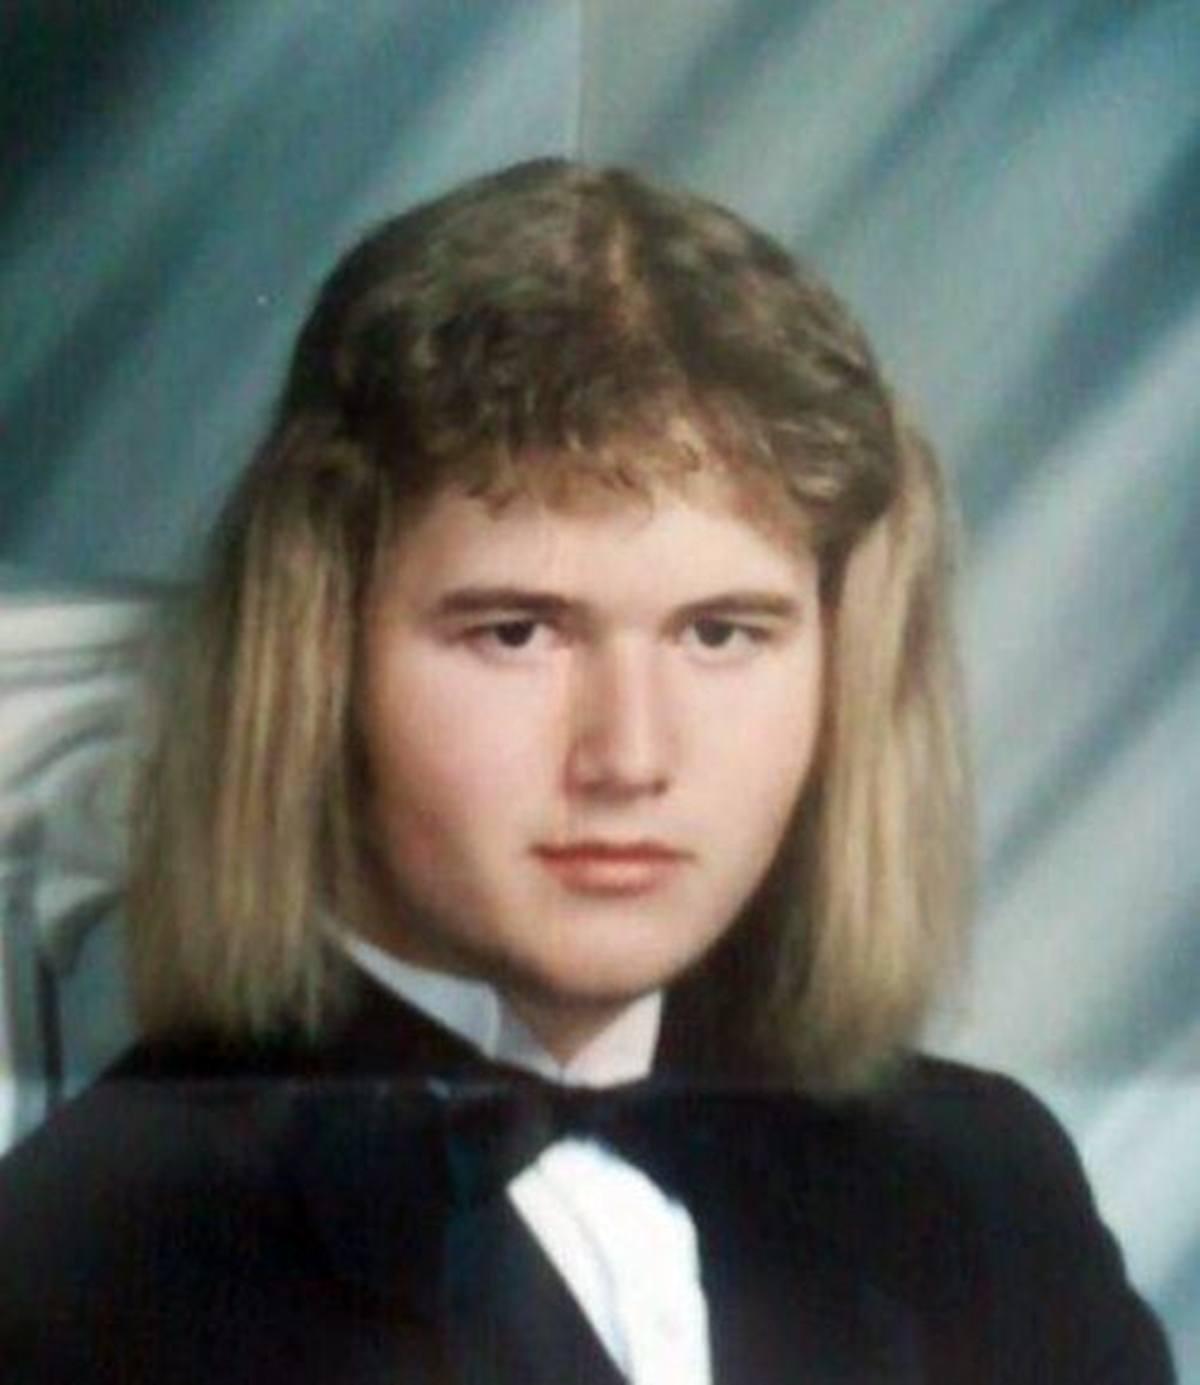 14 15 Hilariously Awkward Yearbook Photos